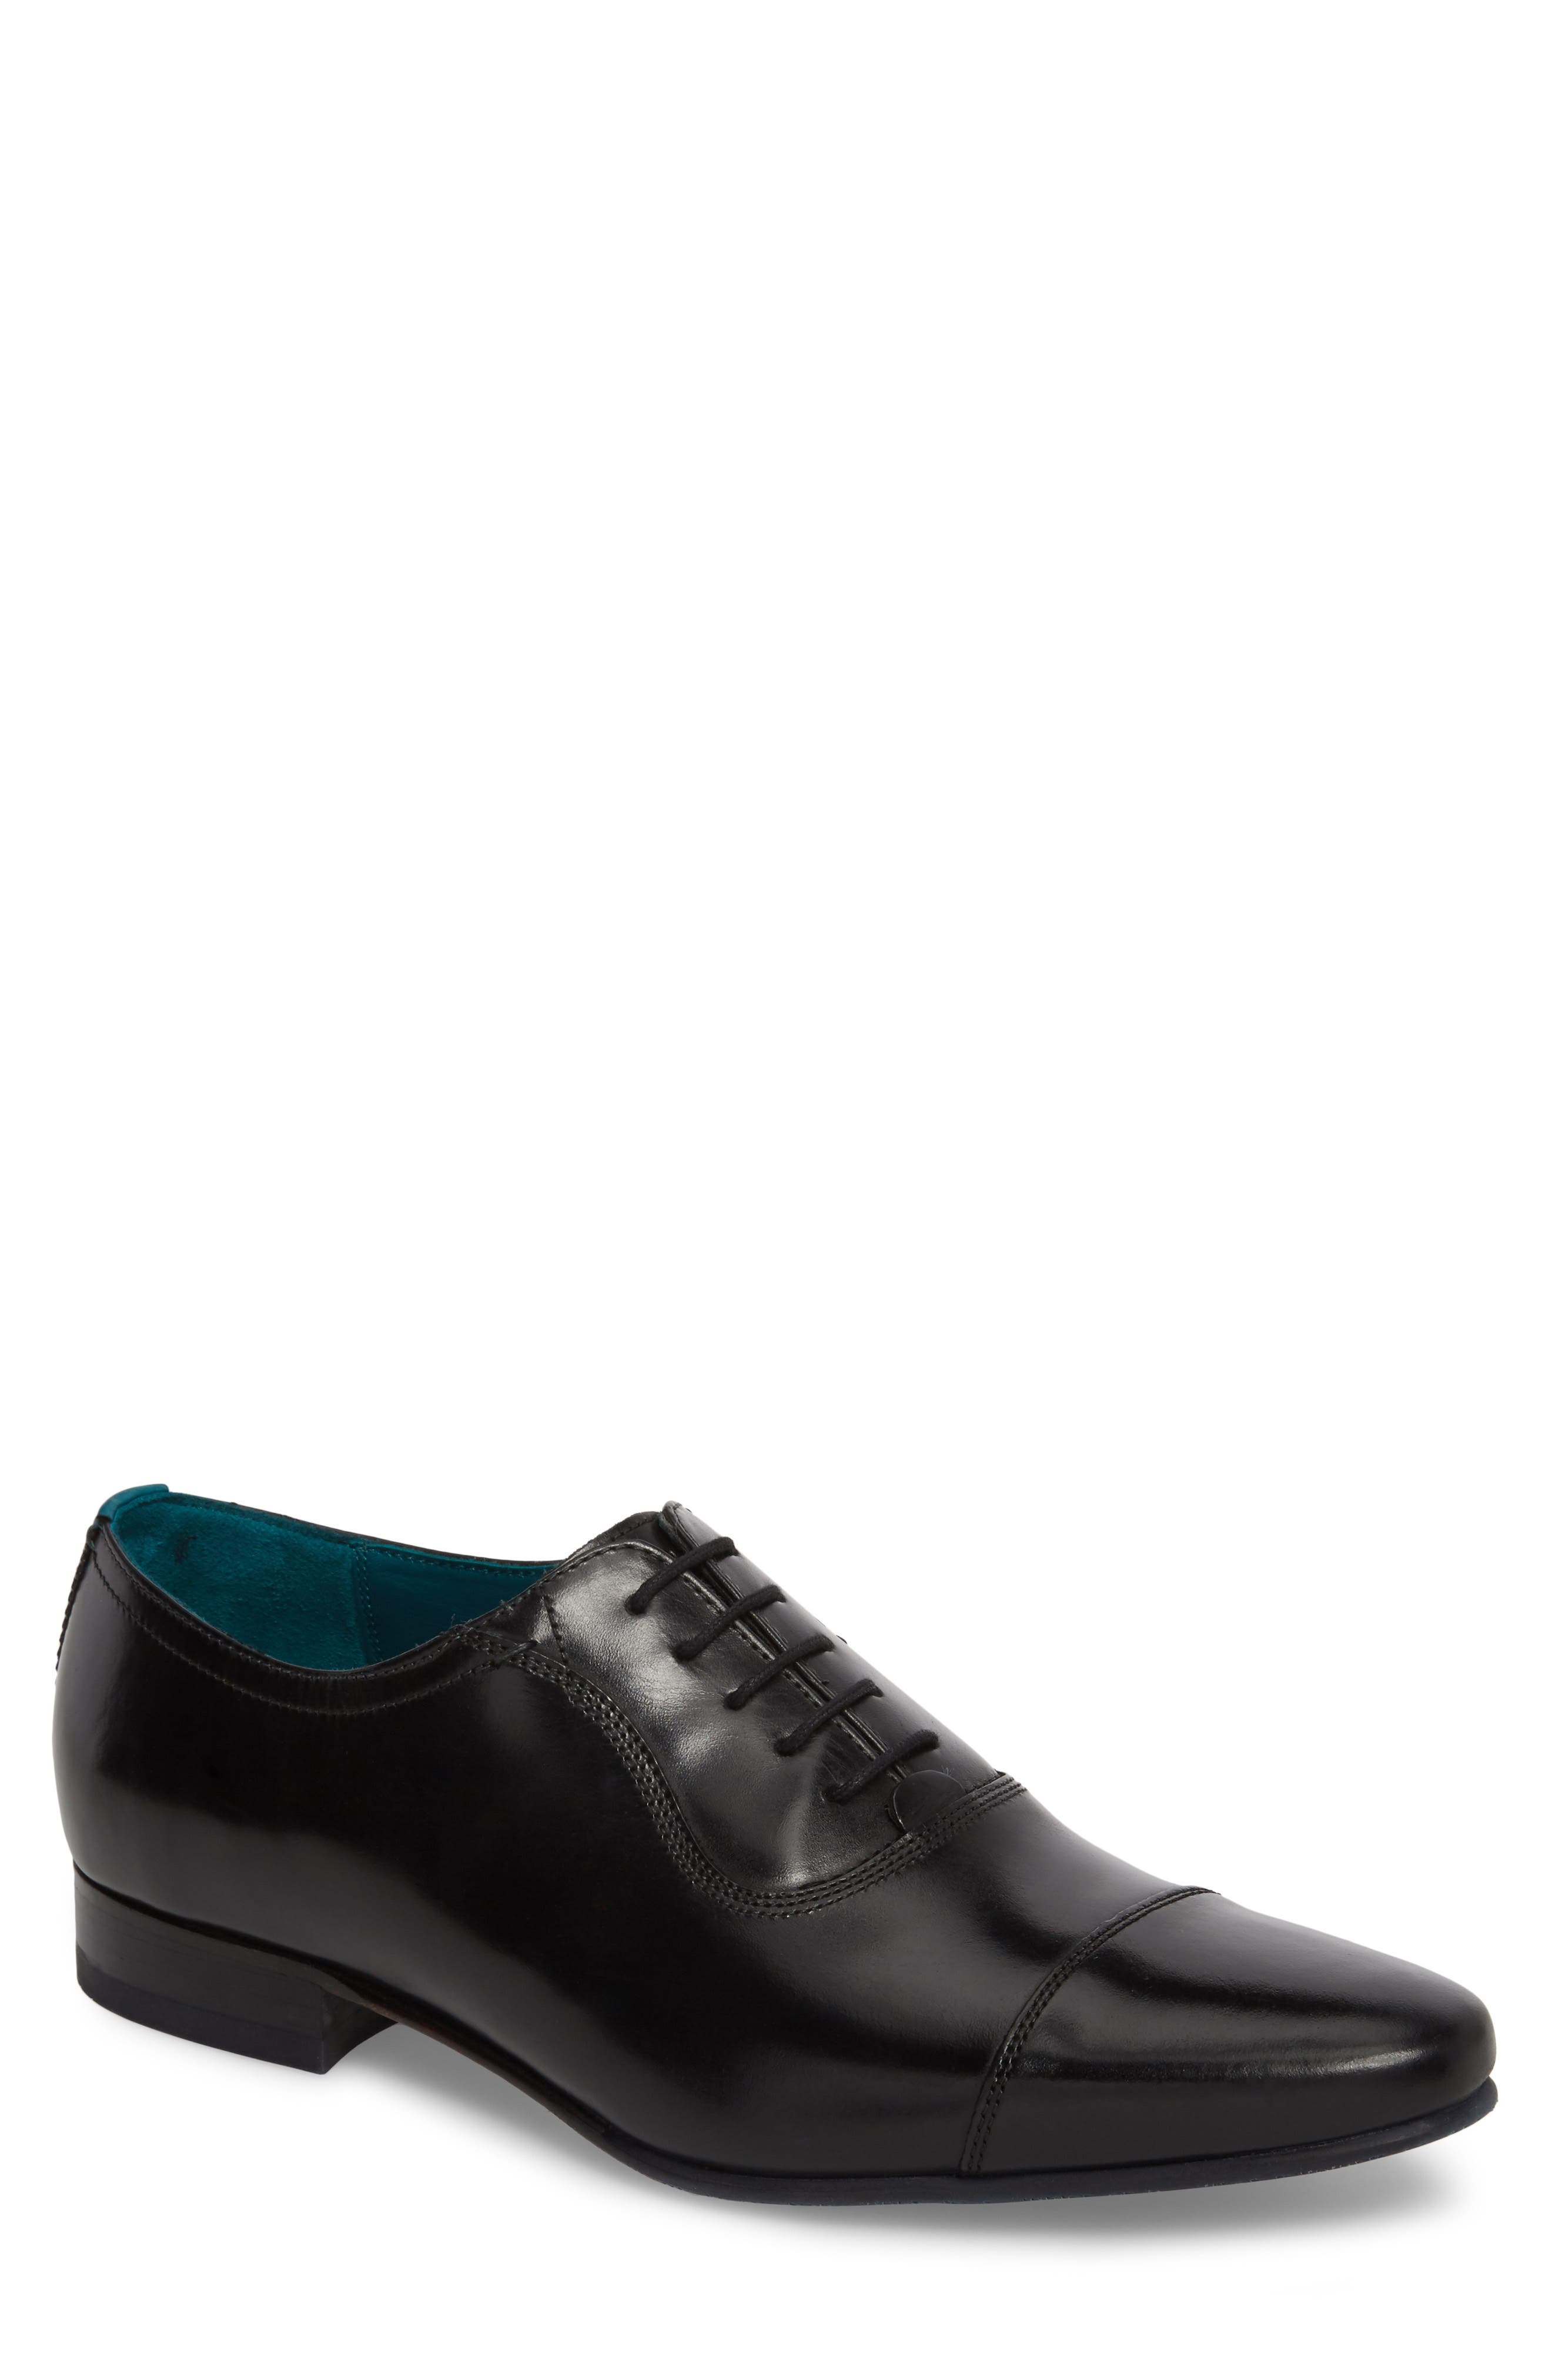 Karney Cap Toe Oxford, Main, color, BLACK LEATHER